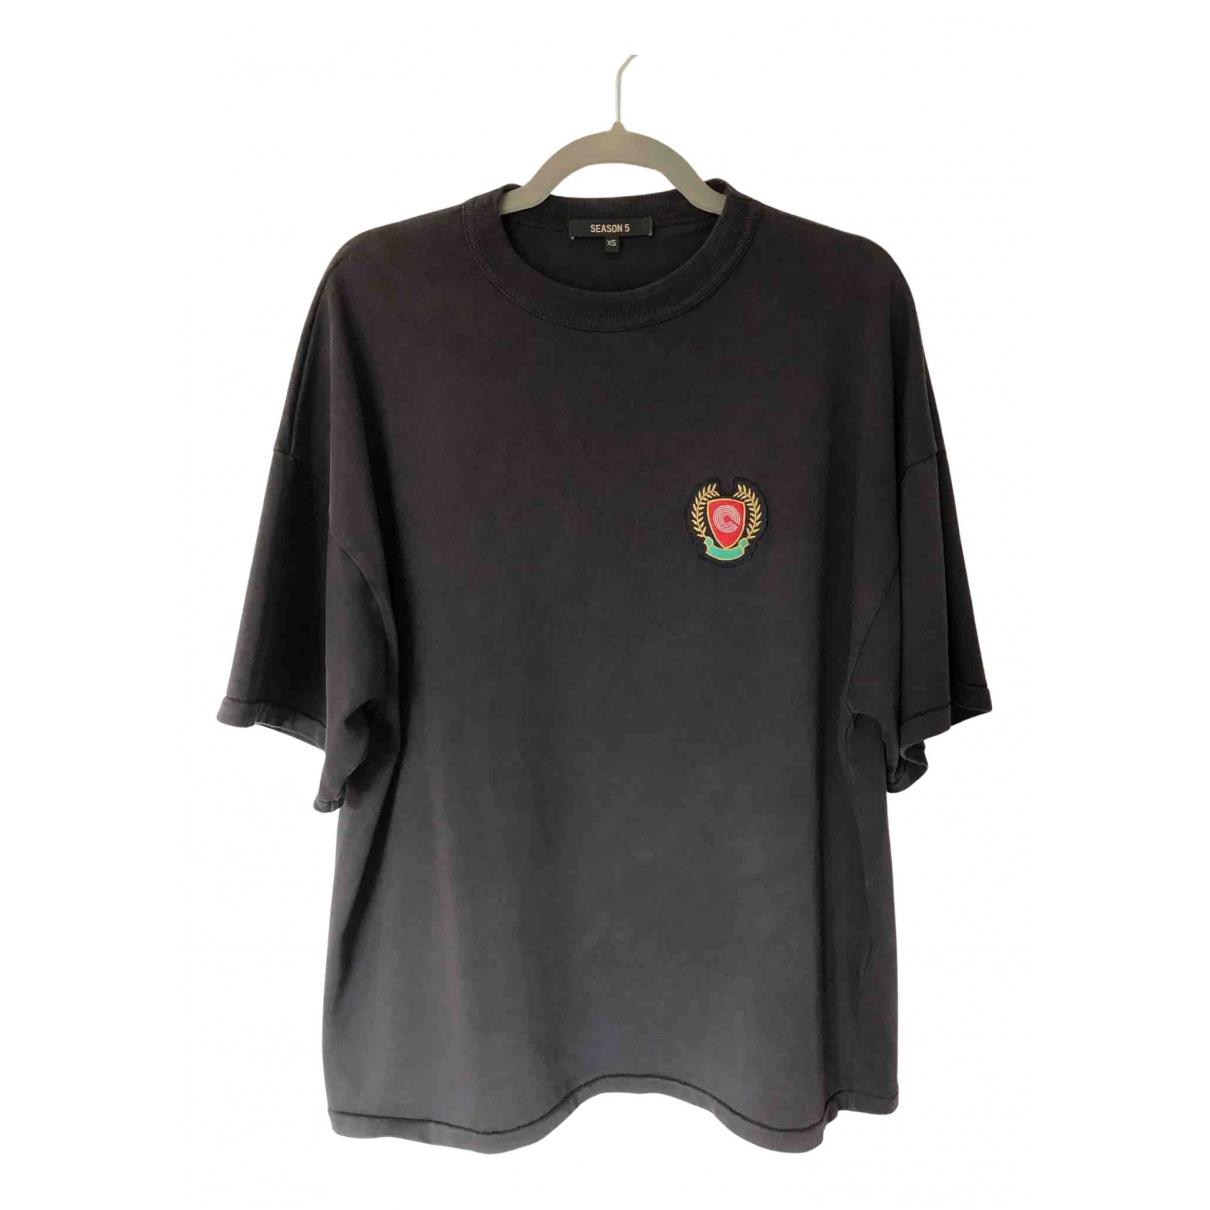 Yeezy X Adidas - Tee shirts   pour homme en coton - anthracite